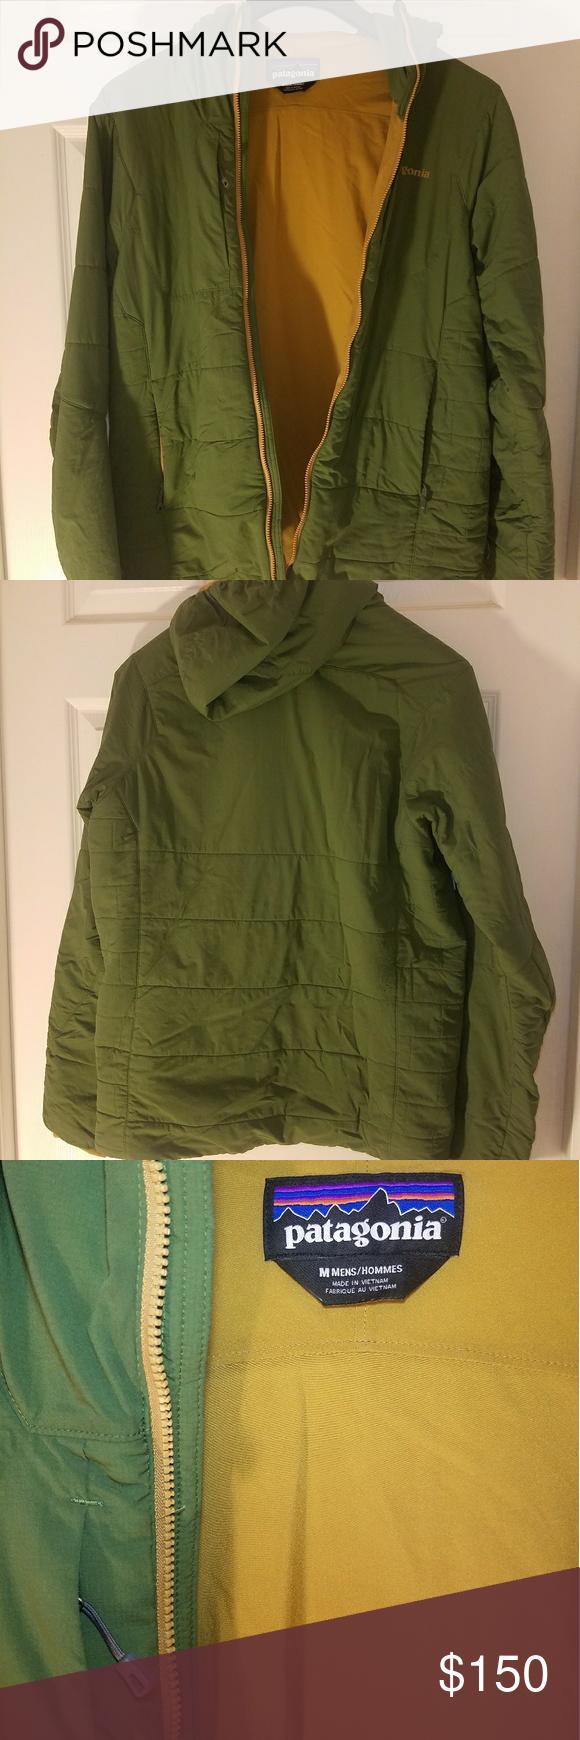 Rare color! Patagonia Nano air hoodie Hoodies, Clothes